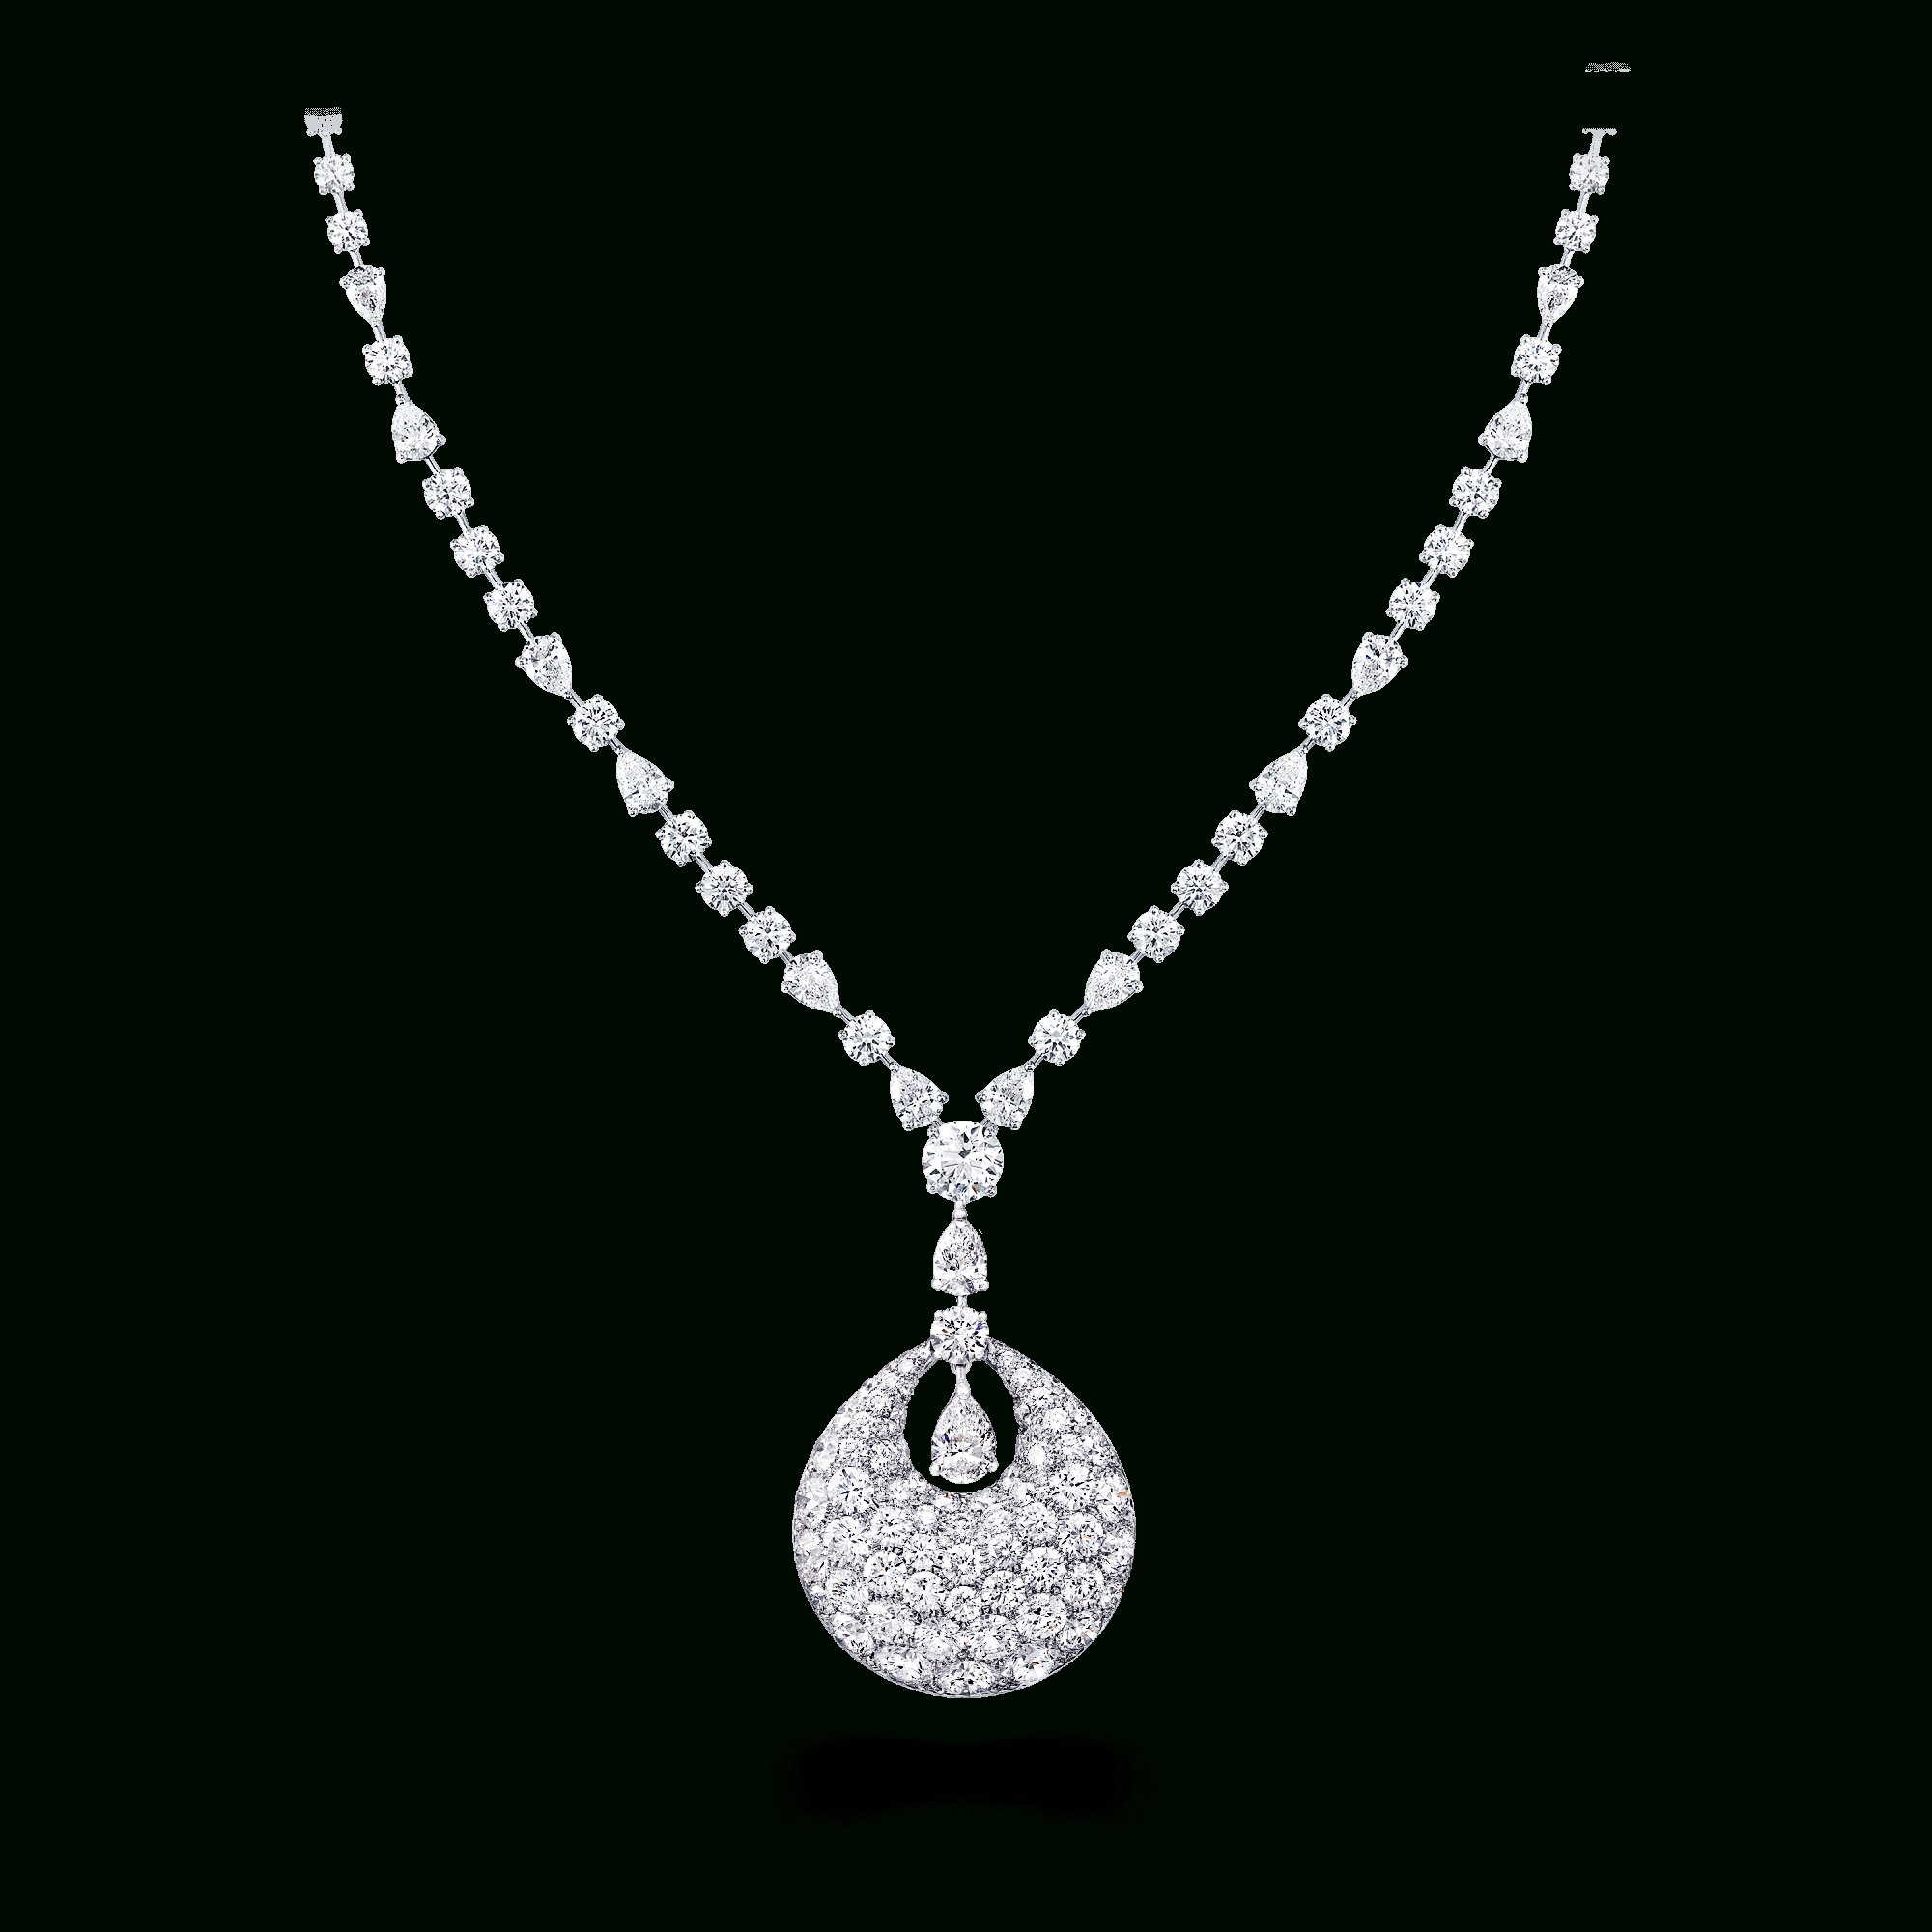 Bombé Necklace, Diamond | Graff With Regard To Most Recent Family Script Locket Element Necklaces (View 9 of 25)